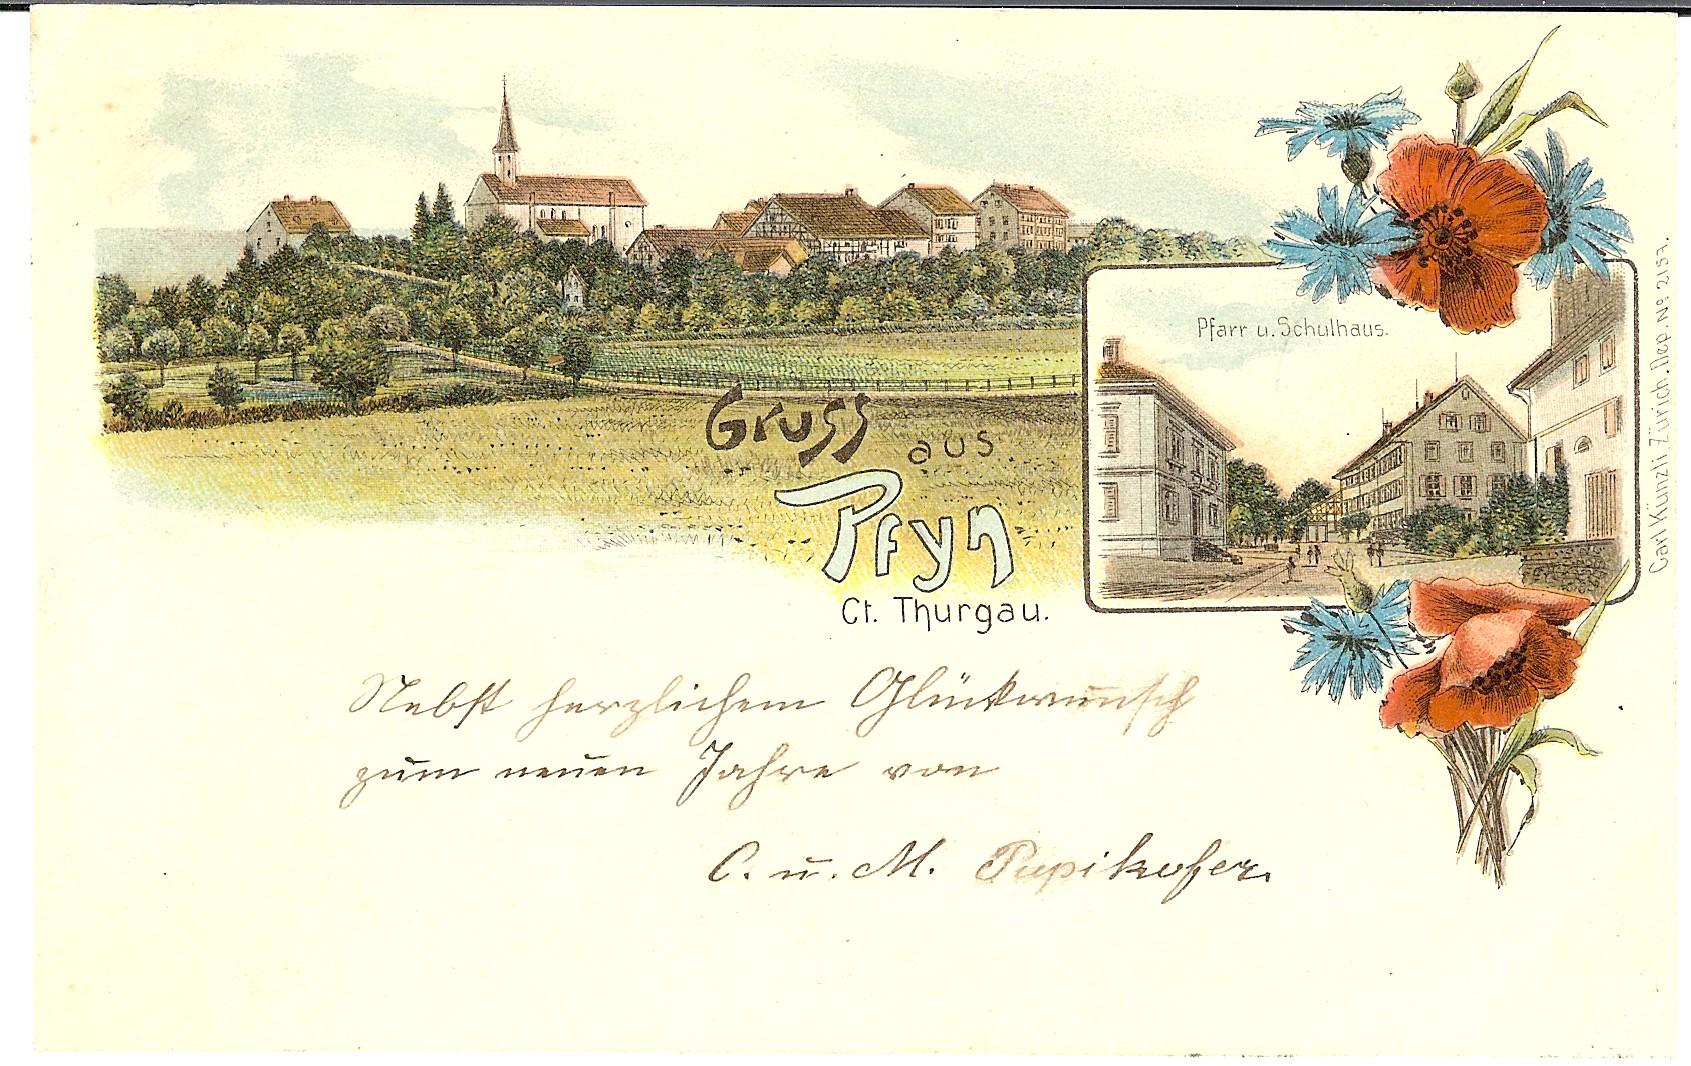 gruss-aus-pfyn-ct-tg-31-iix-99-k-5.jpg